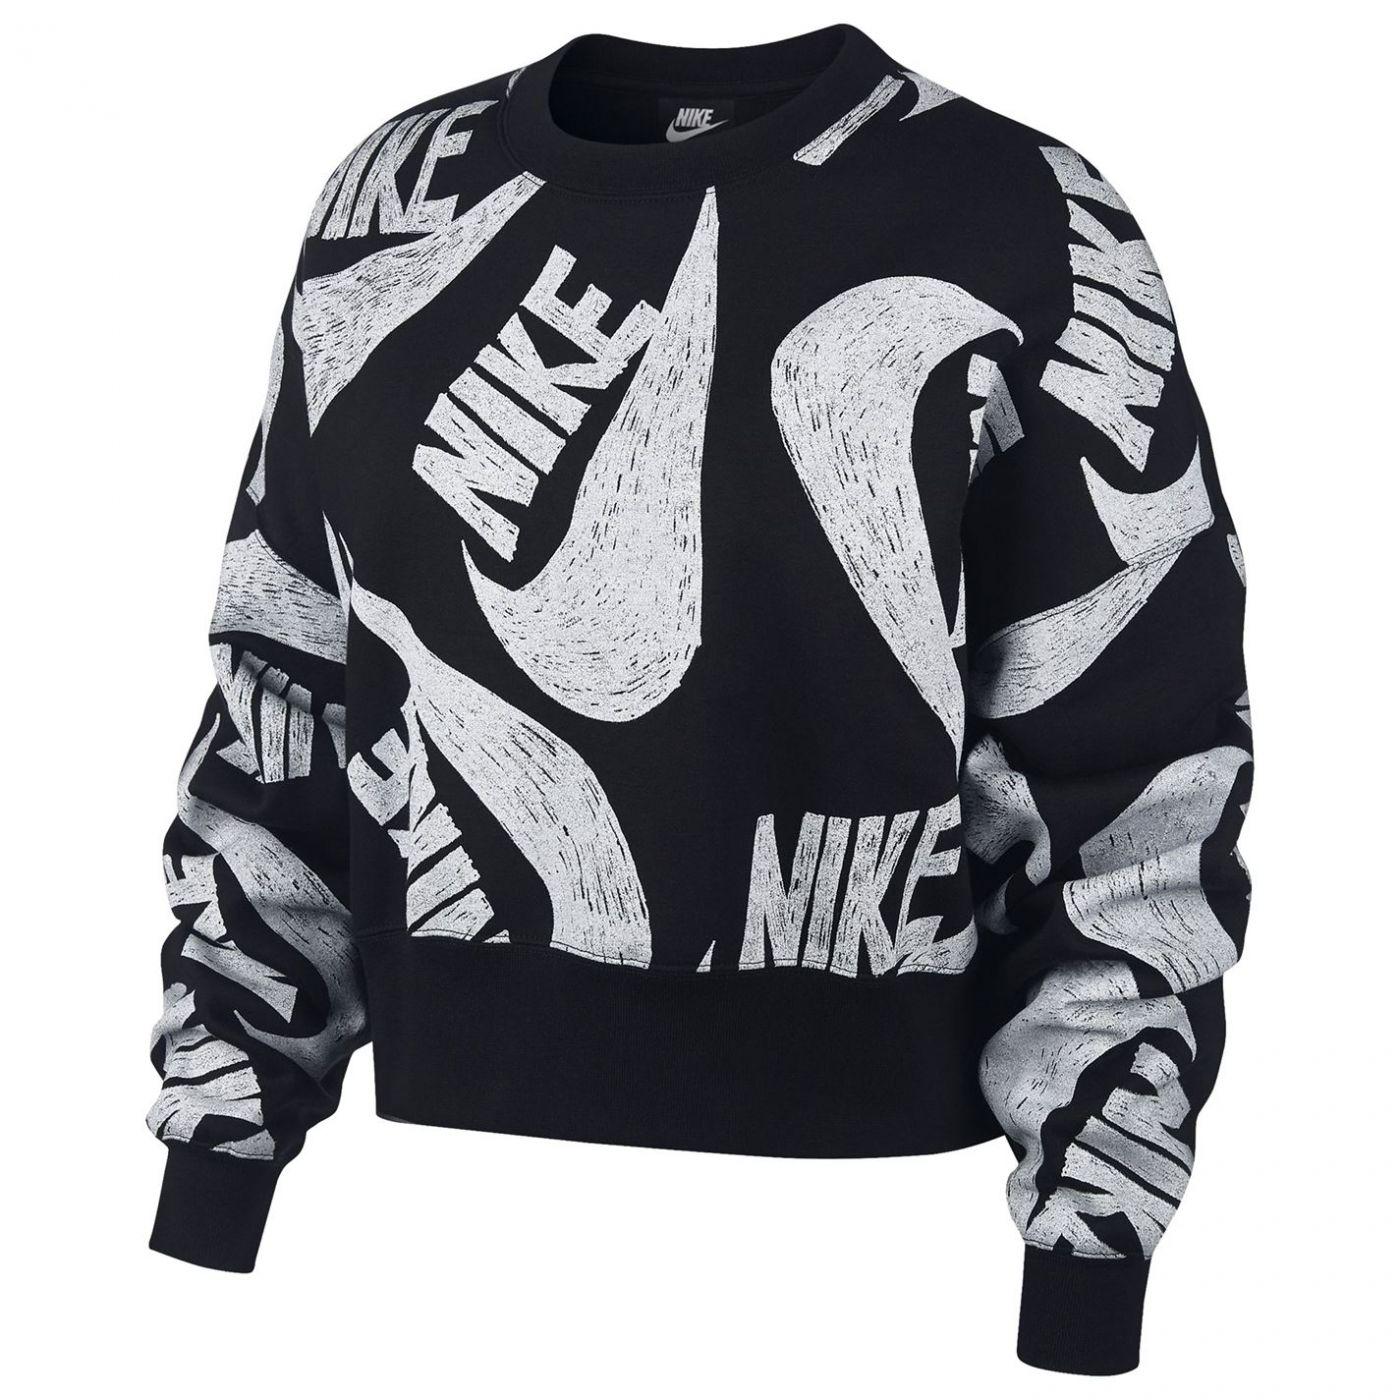 Nike Icon Clash Crew Sweatshirt Ladies